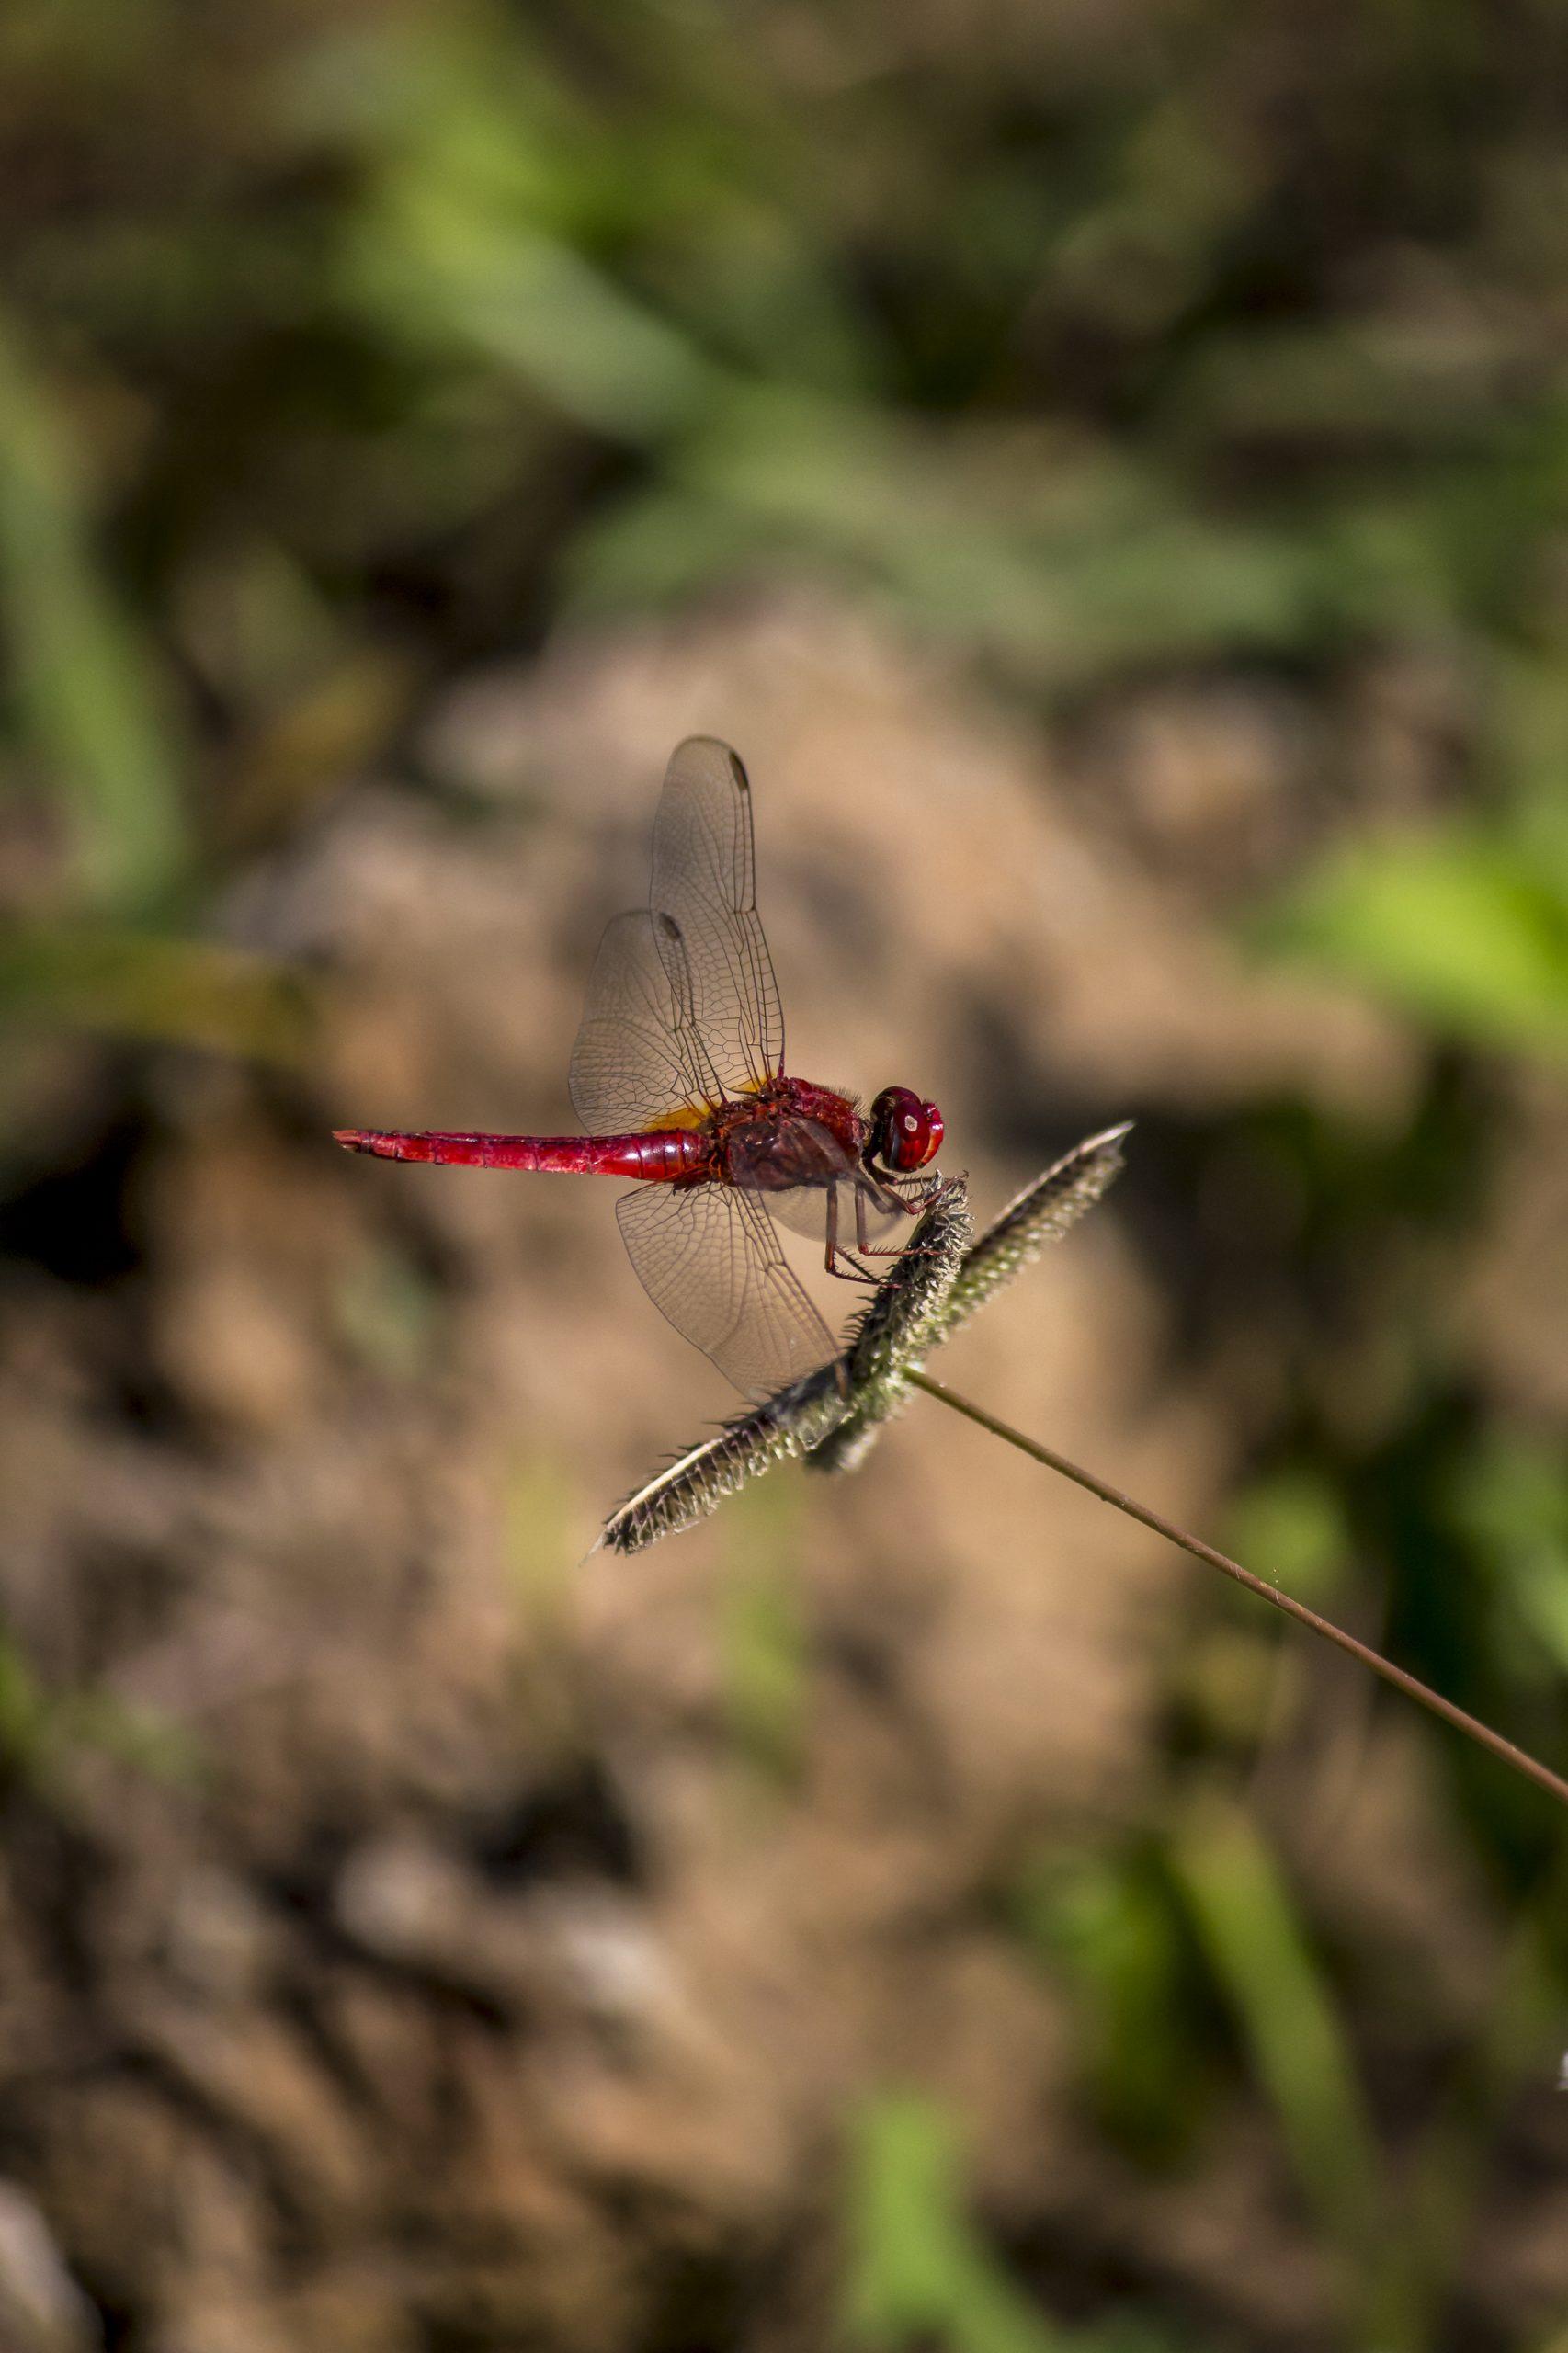 Dragonfly Sitting on the Twig